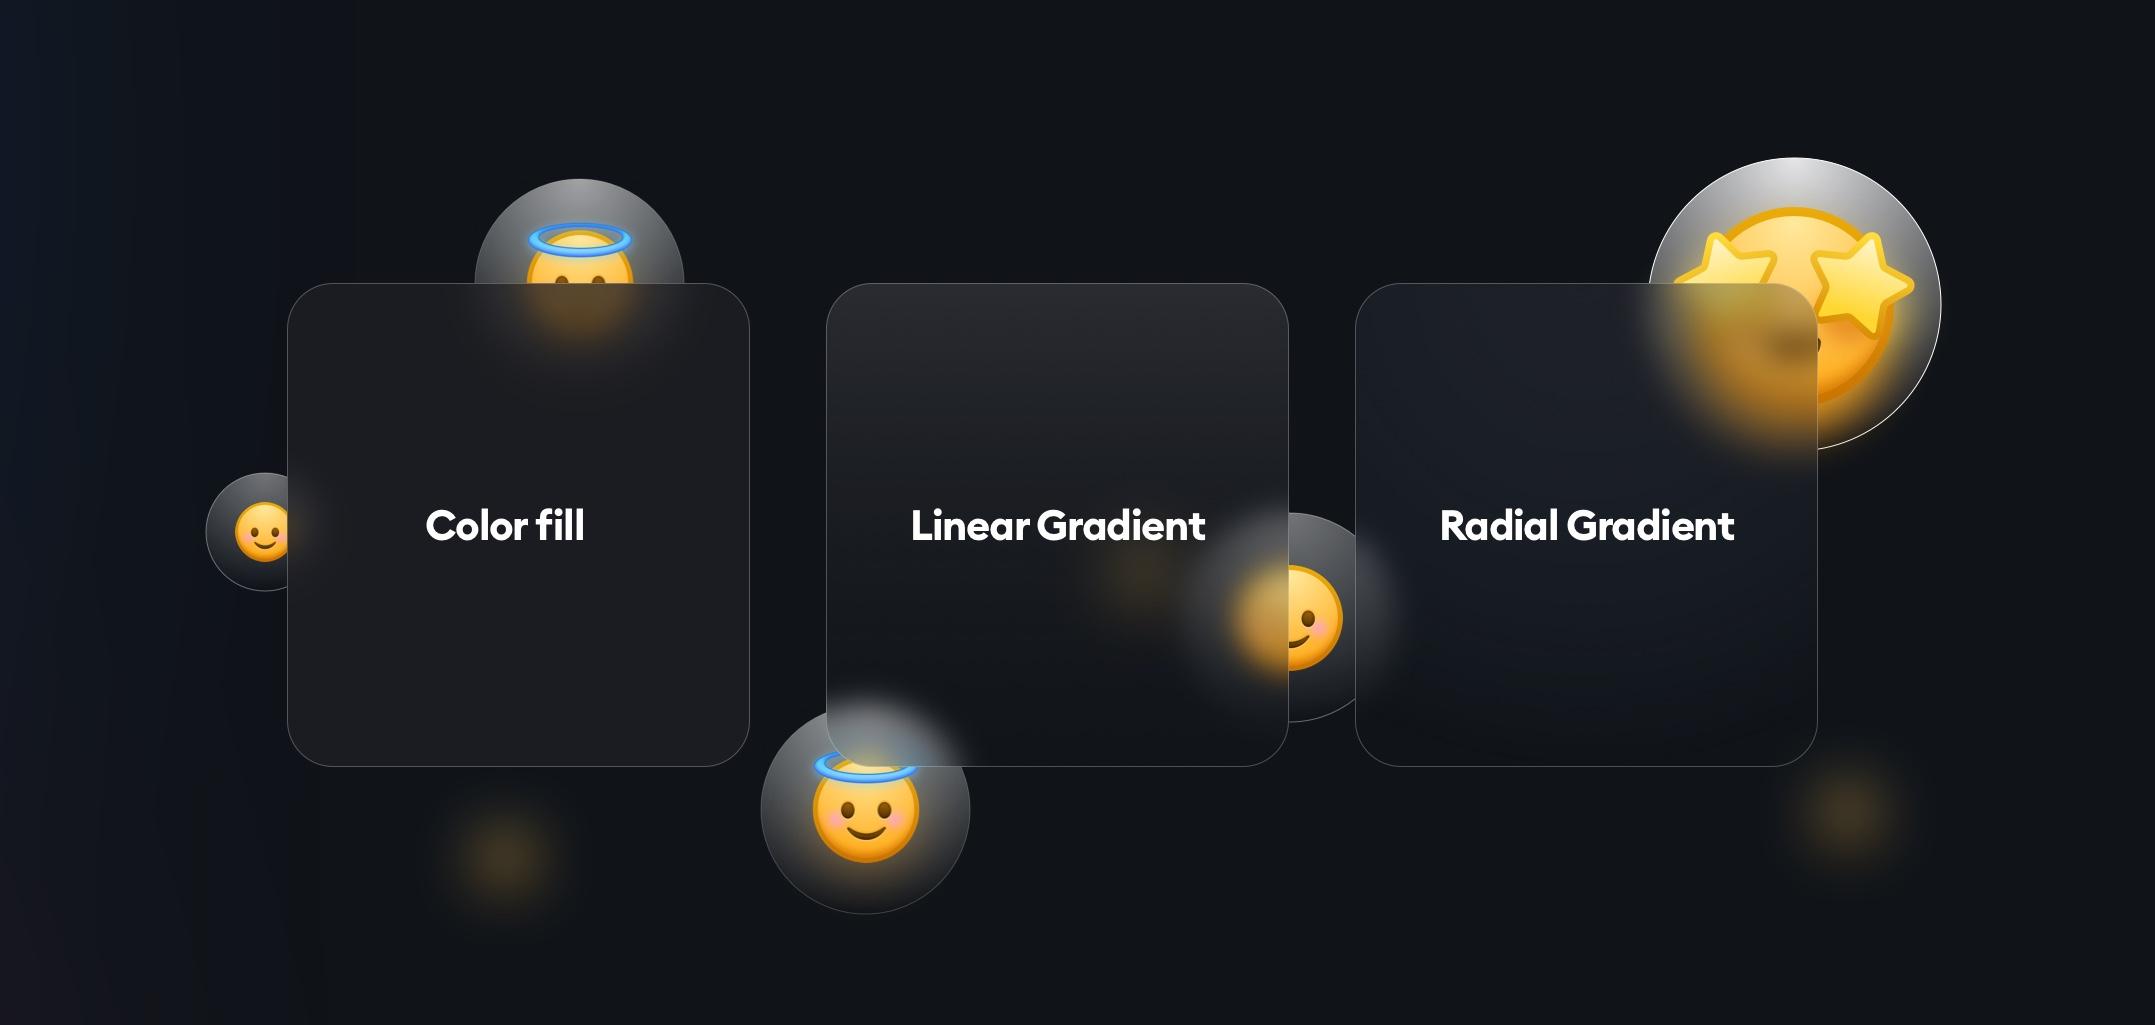 Glassmorphism card styles in Dark Mode